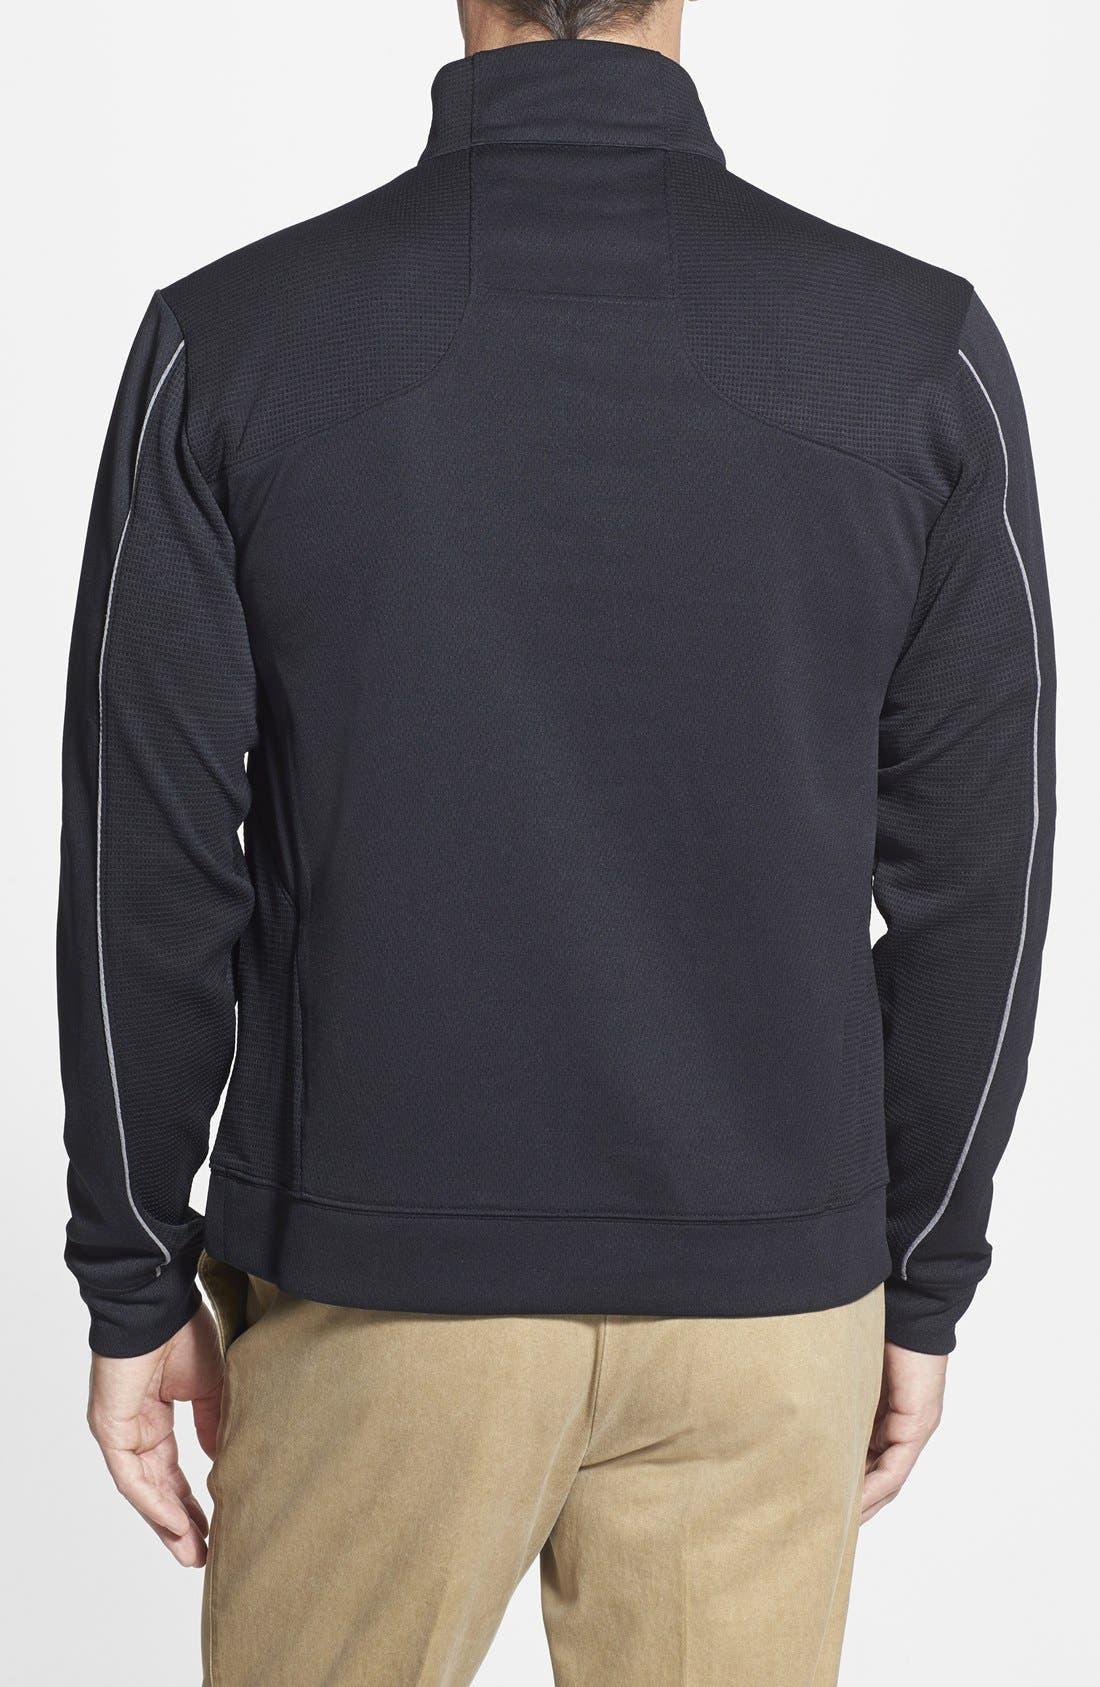 Atlanta Falcons - Edge DryTec Moisture Wicking Half Zip Pullover,                             Alternate thumbnail 2, color,                             Black